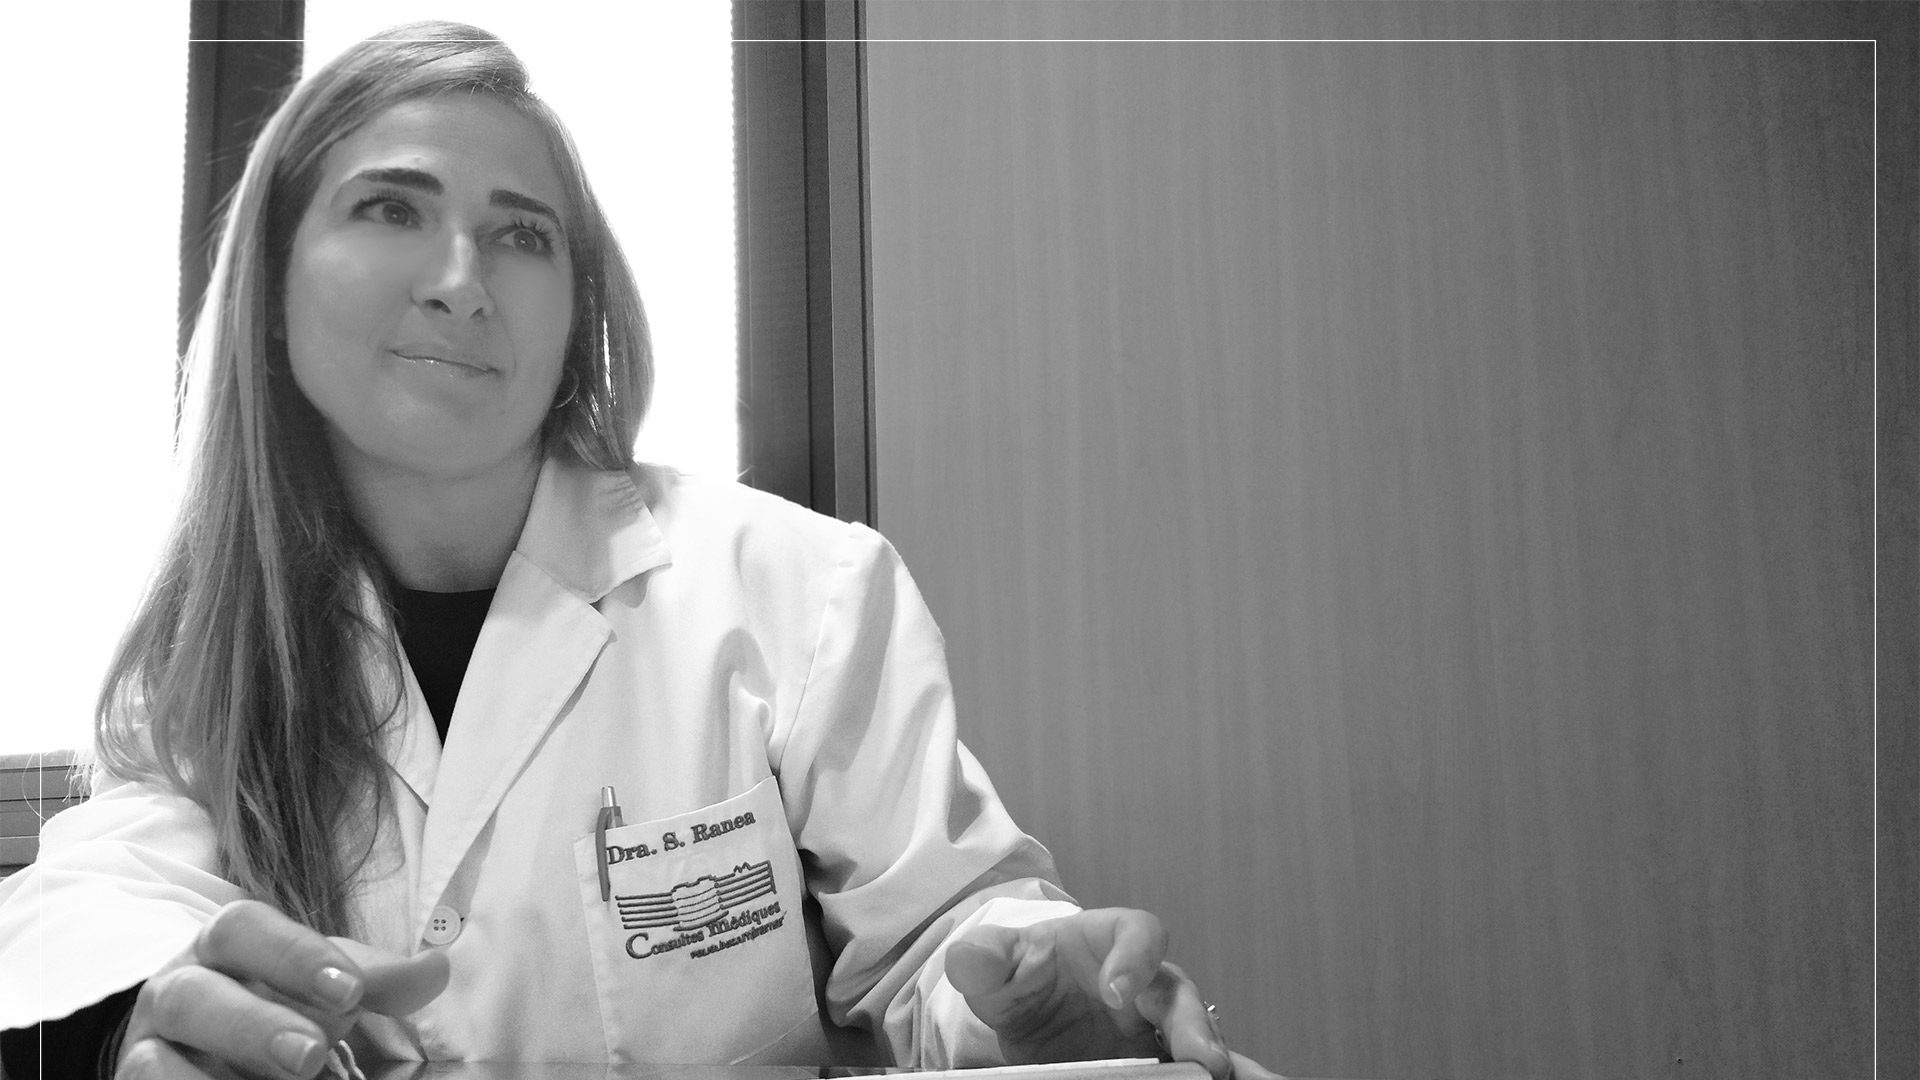 Alergologos Palma | Doctor Susana Ranea